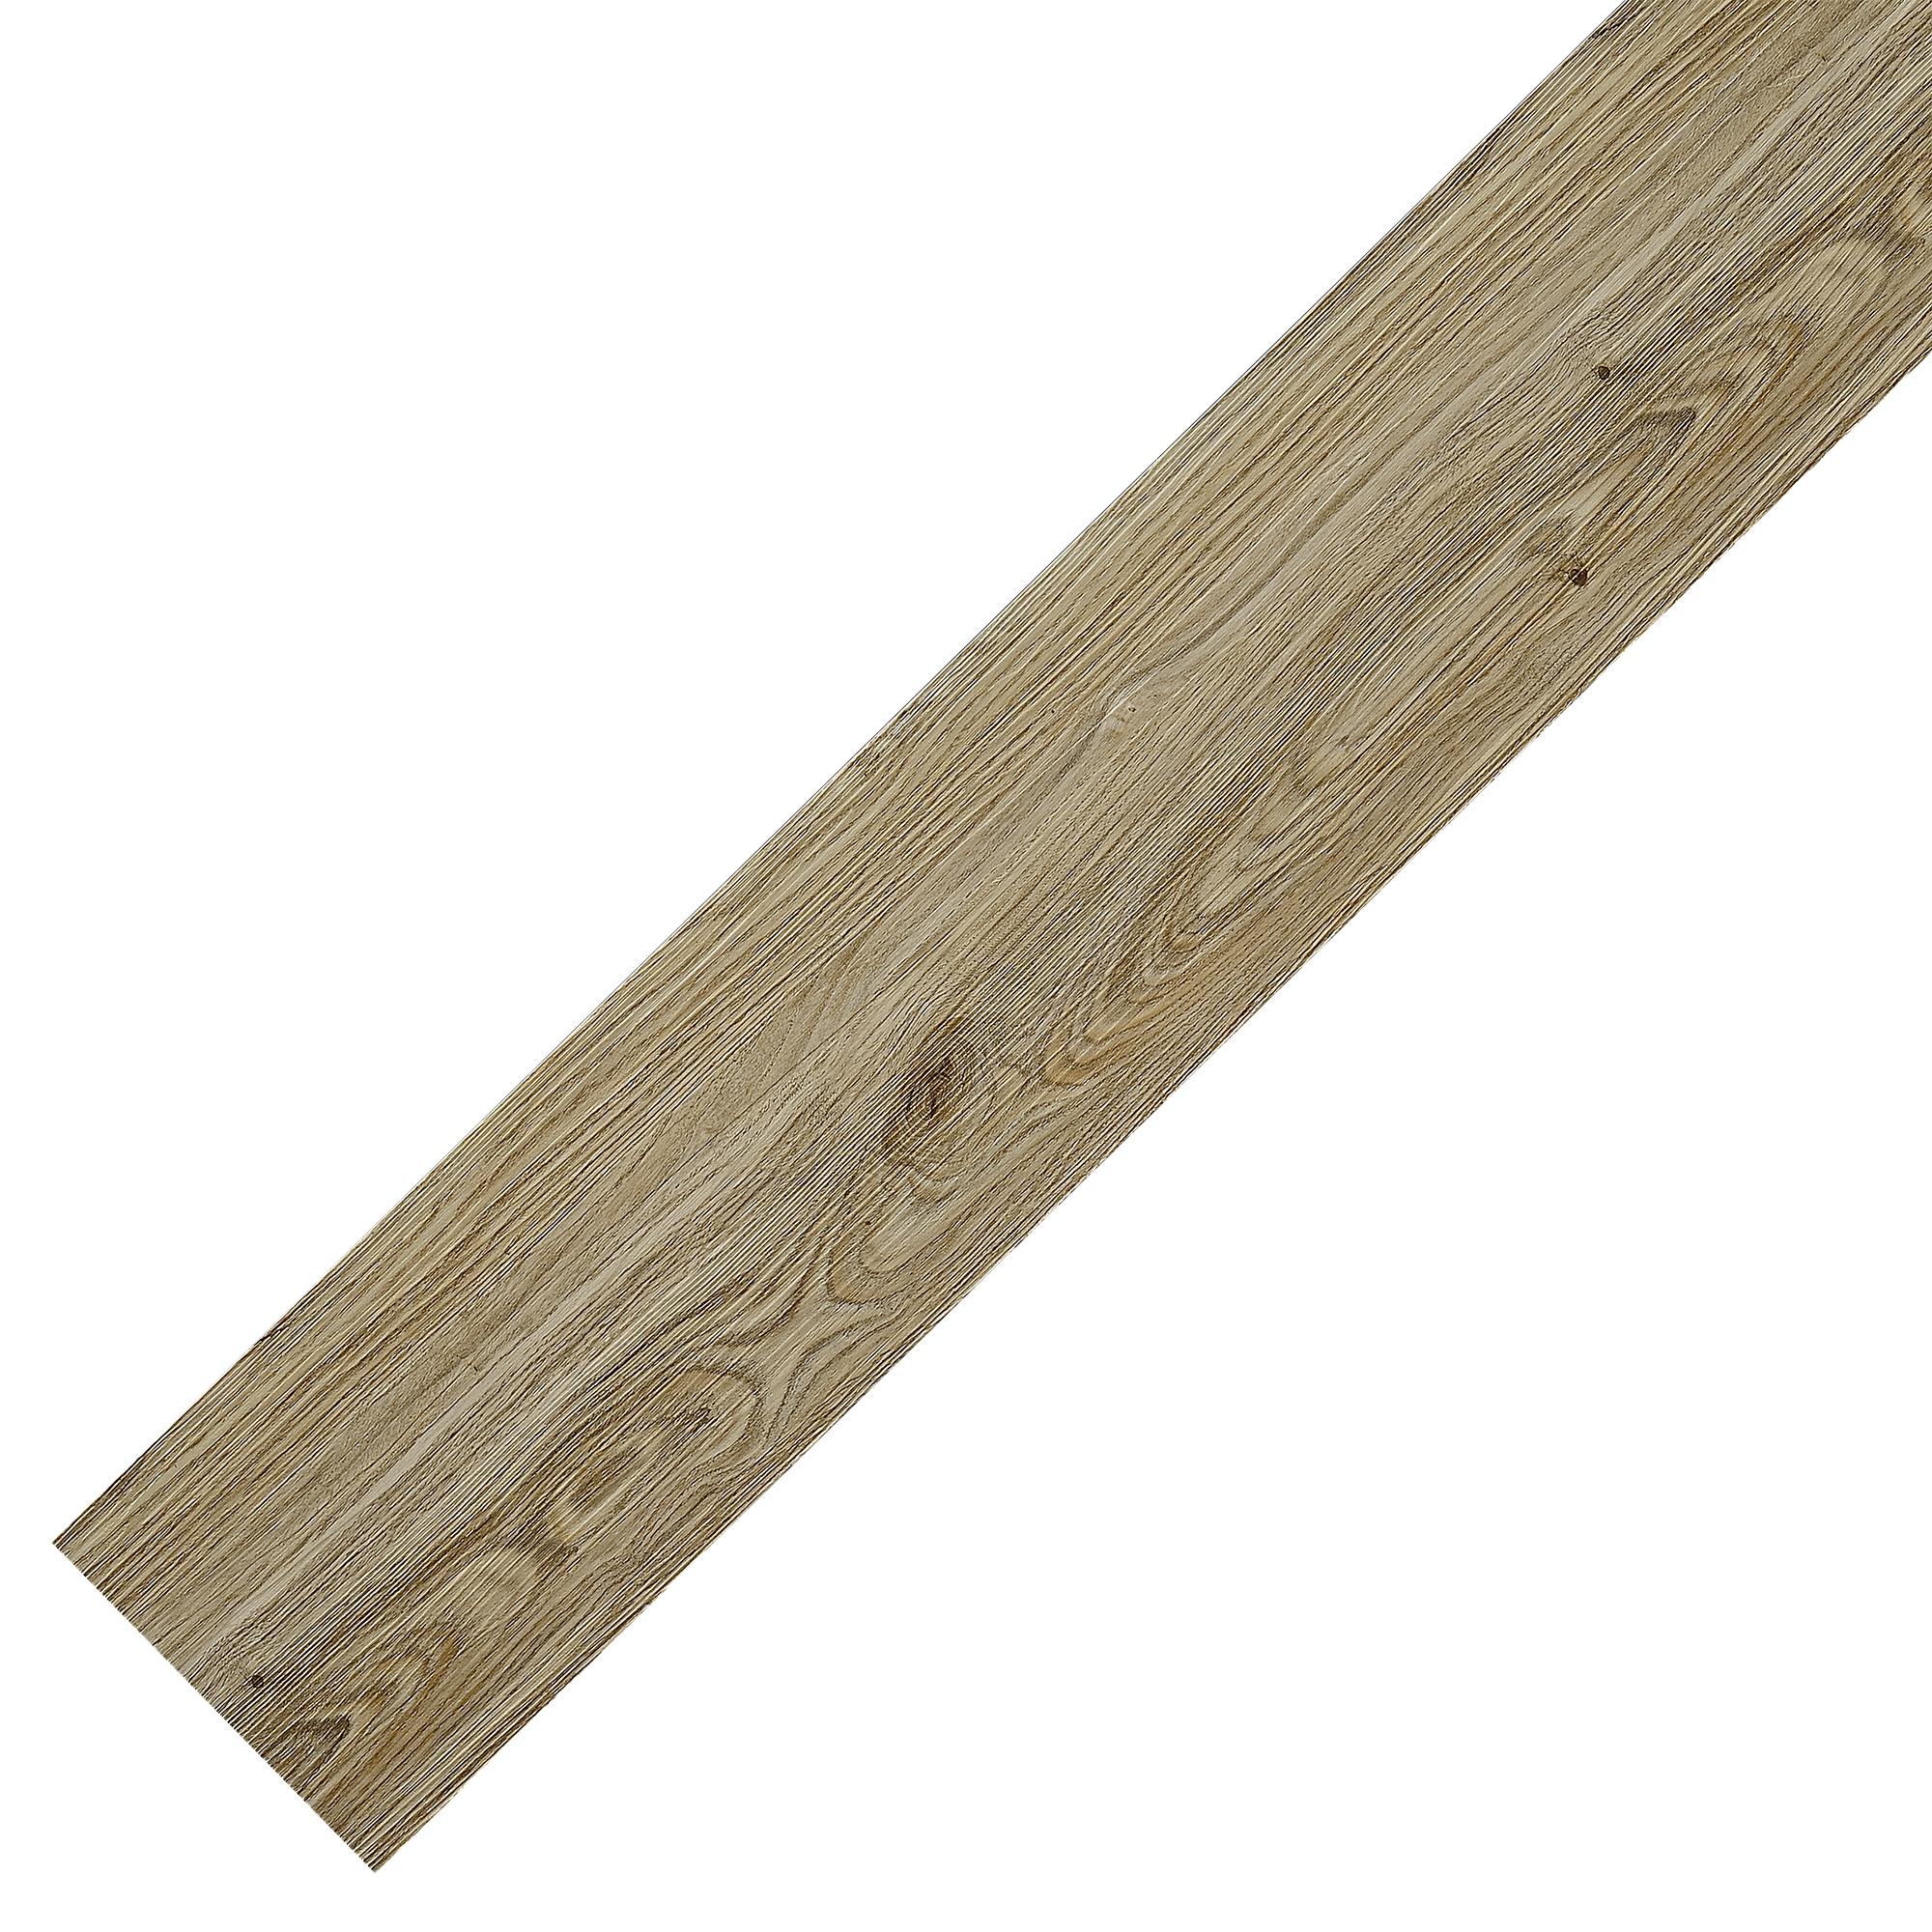 neu holz 1 11m vinyl laminat dielen planken eiche. Black Bedroom Furniture Sets. Home Design Ideas